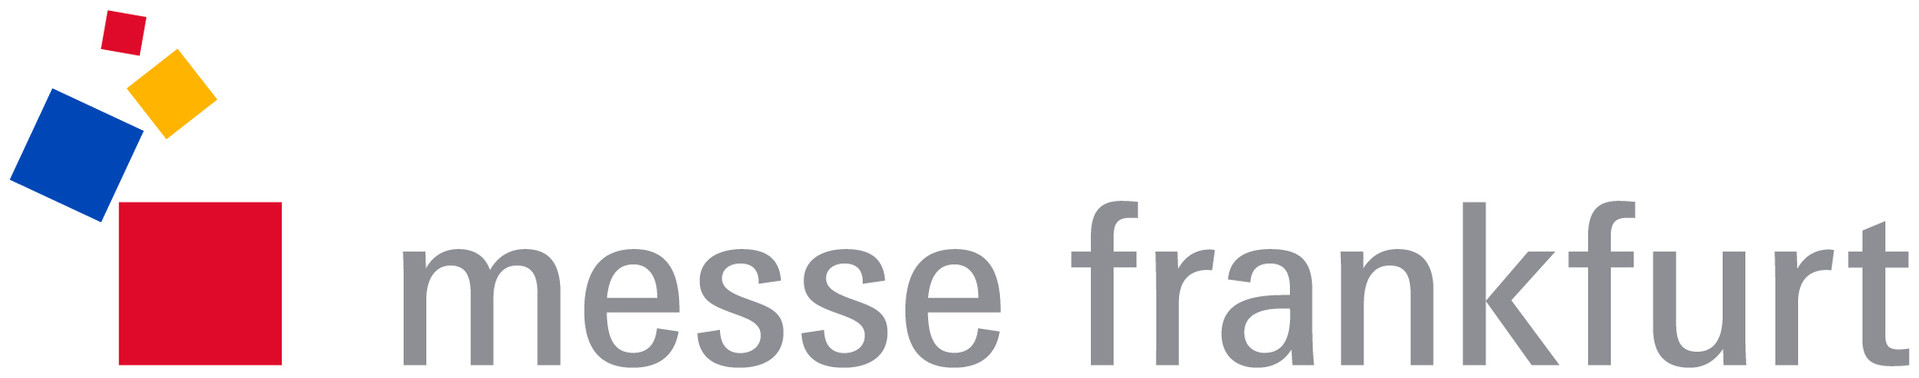 MF_logo.jpg